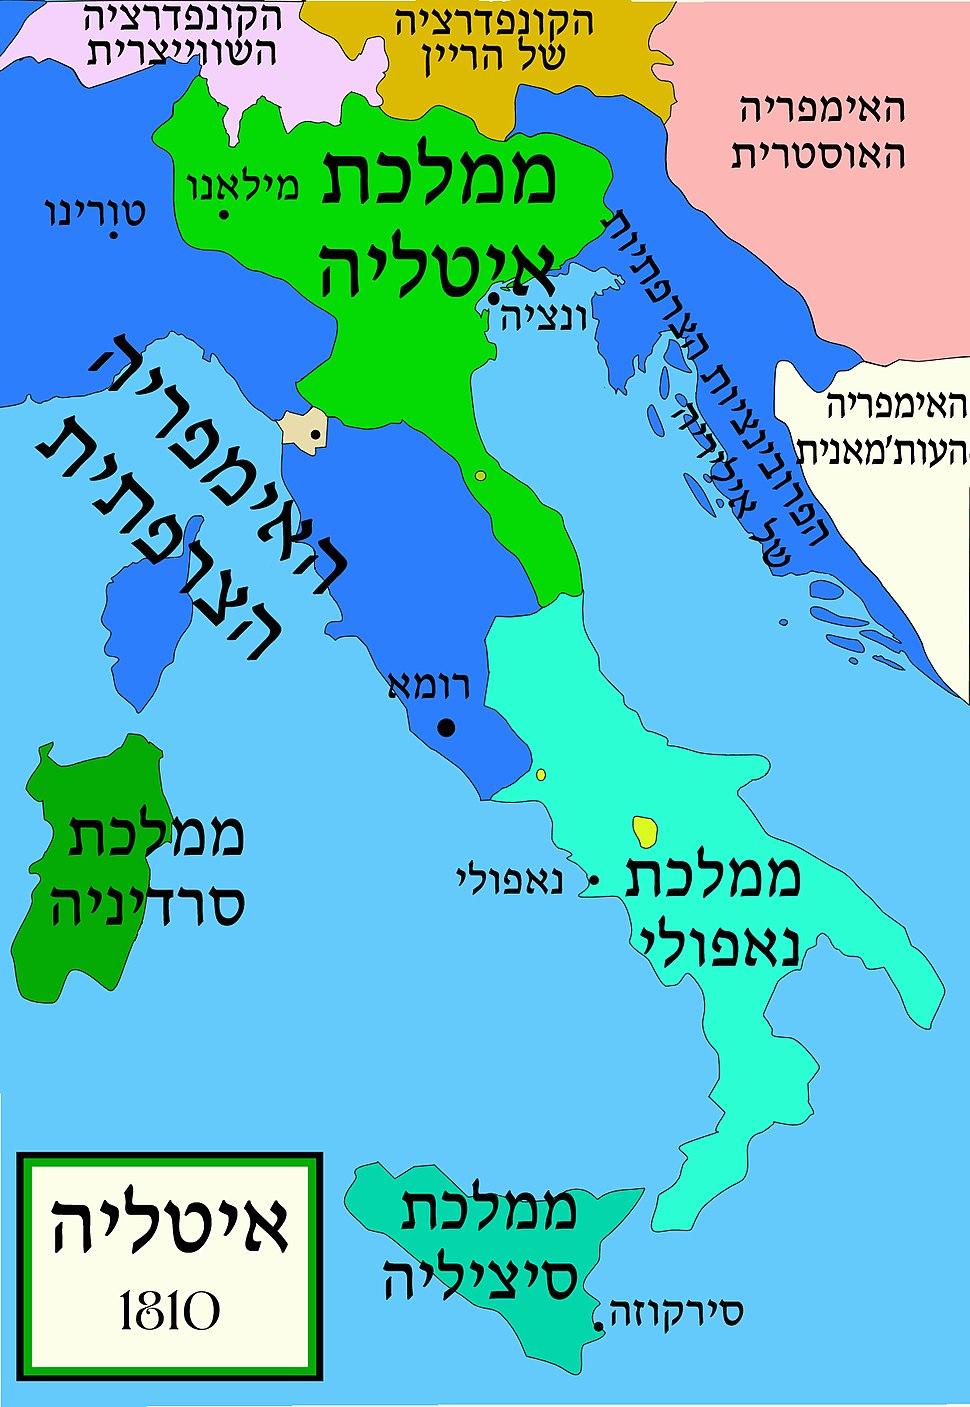 Italy 1810 heb